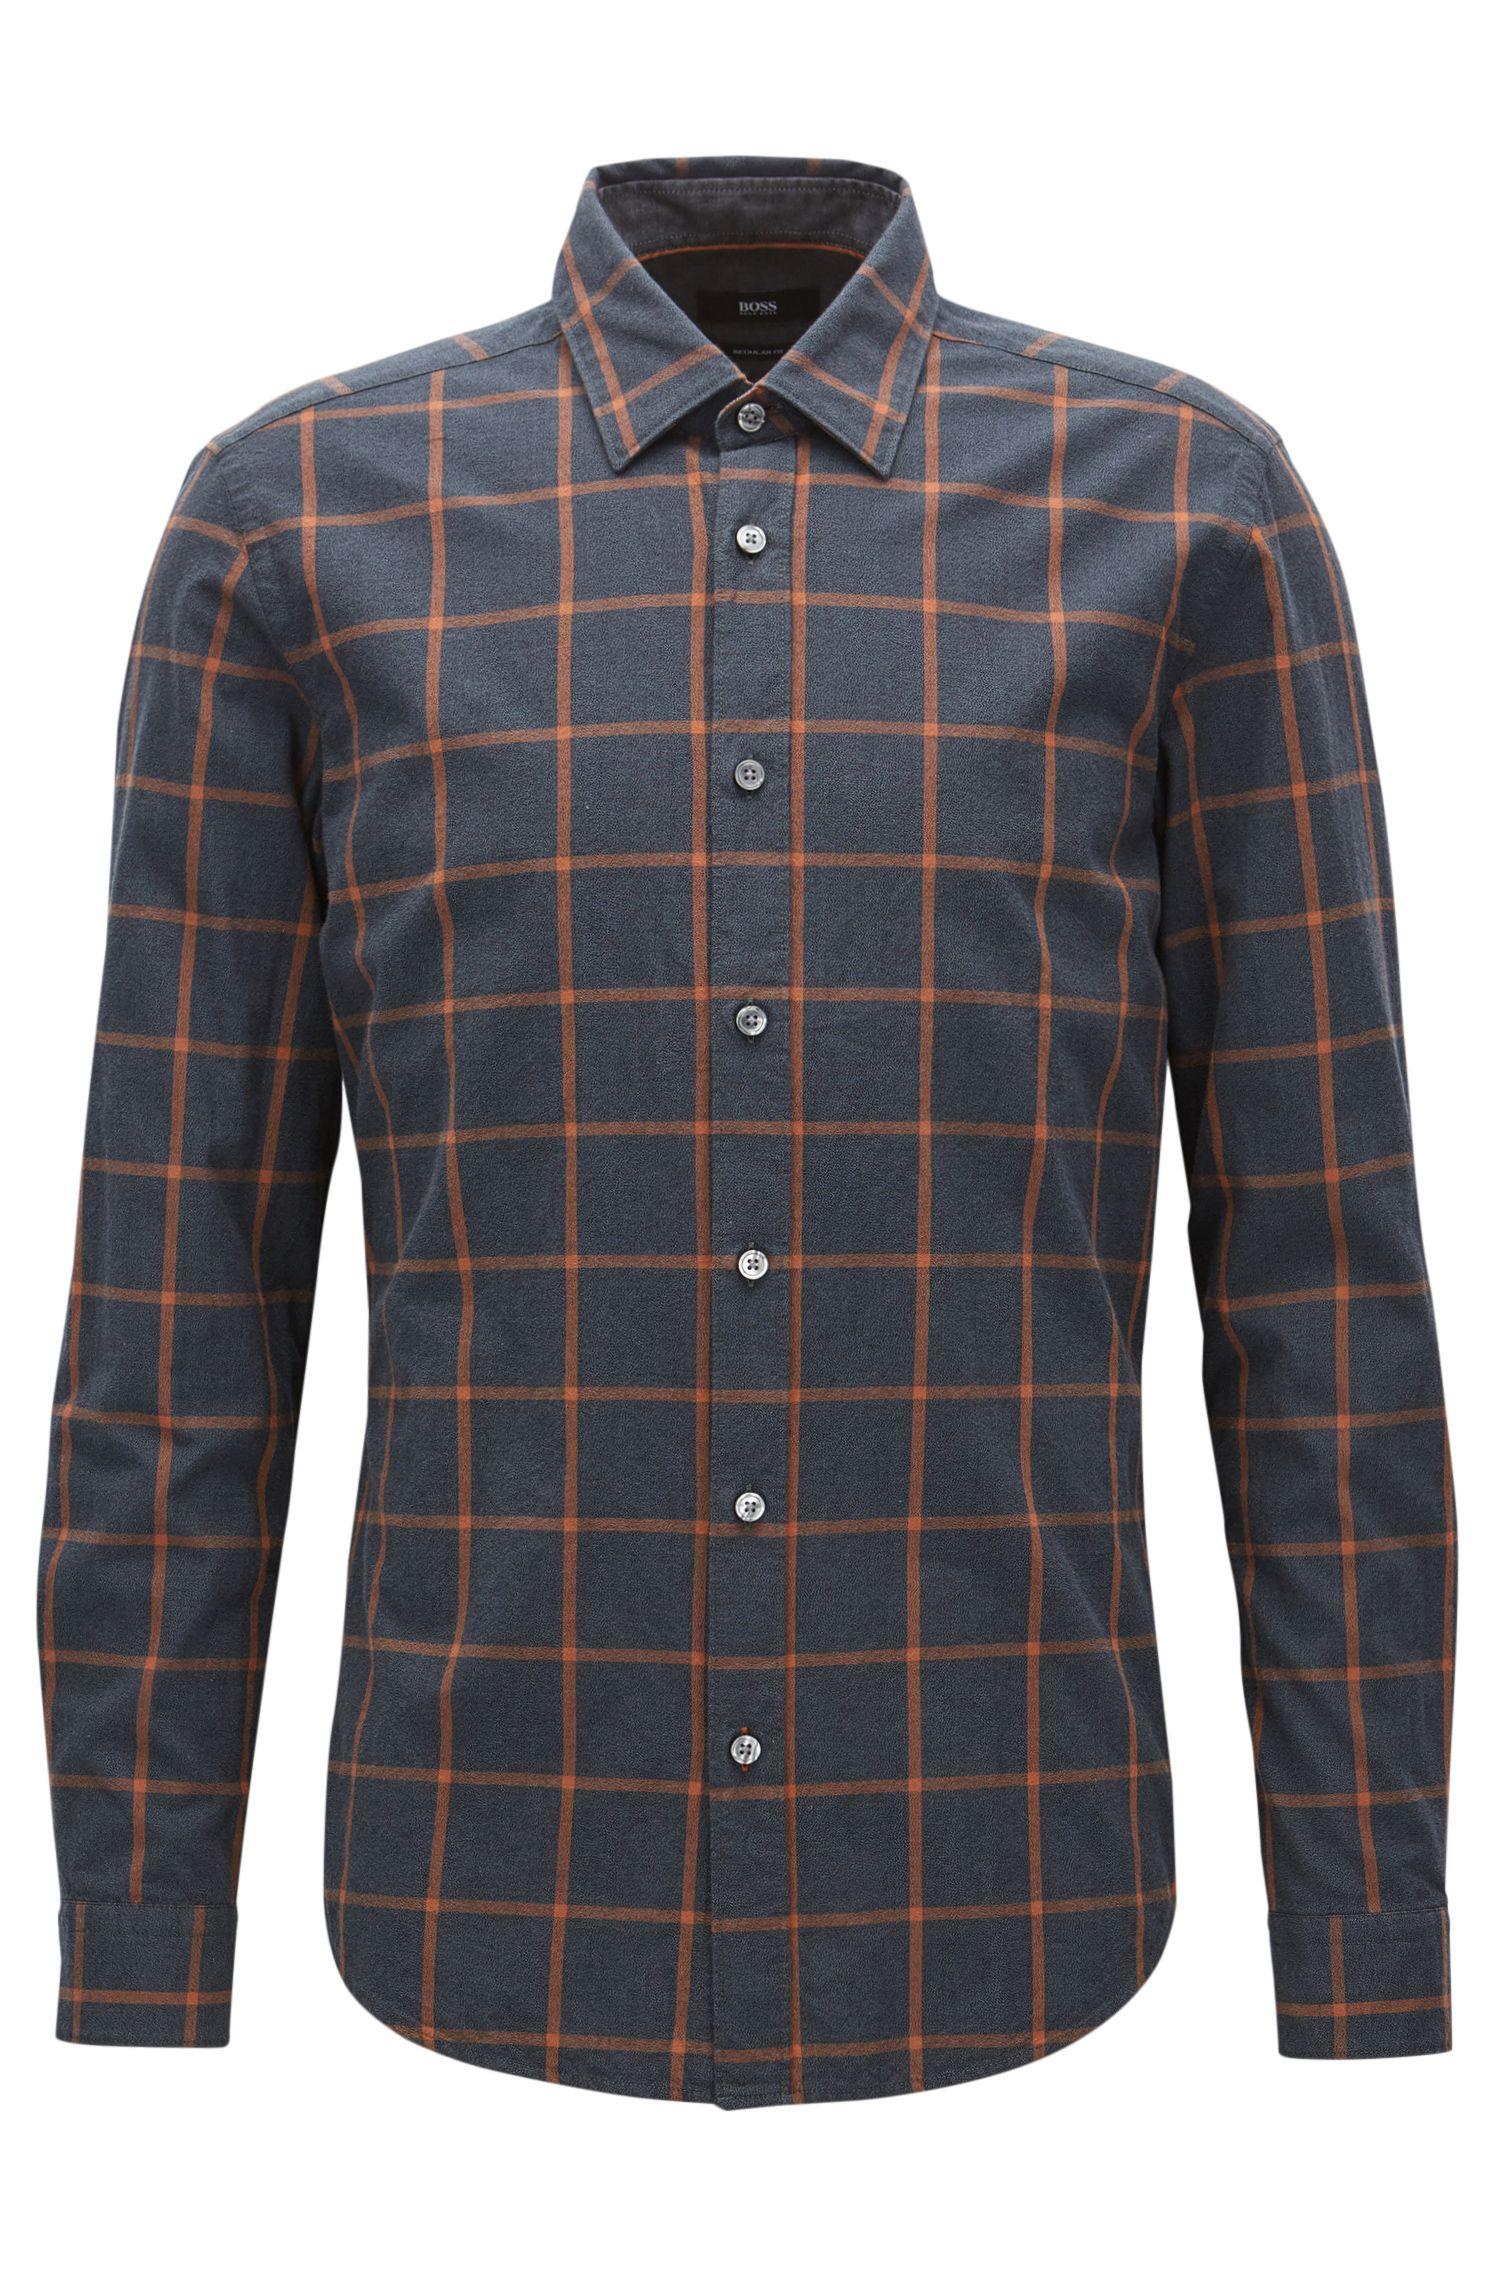 'Lukas' | Regular Fit, Windowpane Check Cotton Button Down Shirt